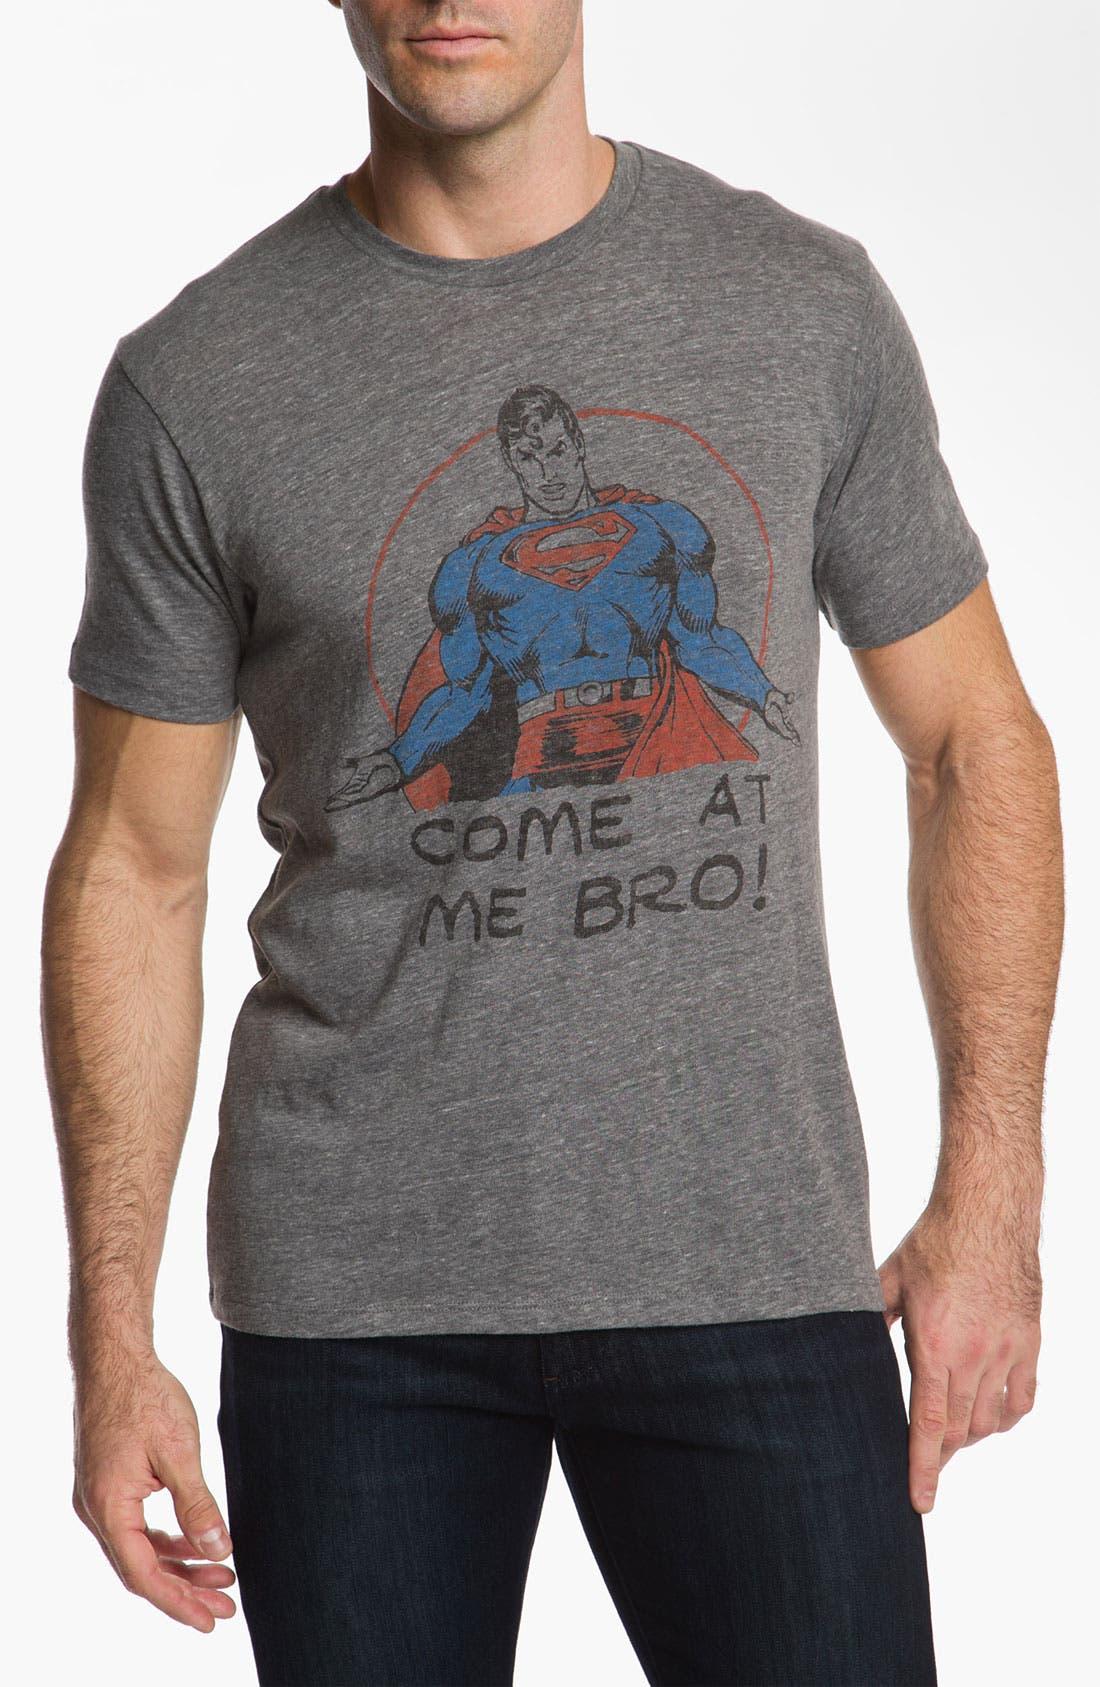 Alternate Image 1 Selected - Junk Food 'Come at Me Bro' T-Shirt